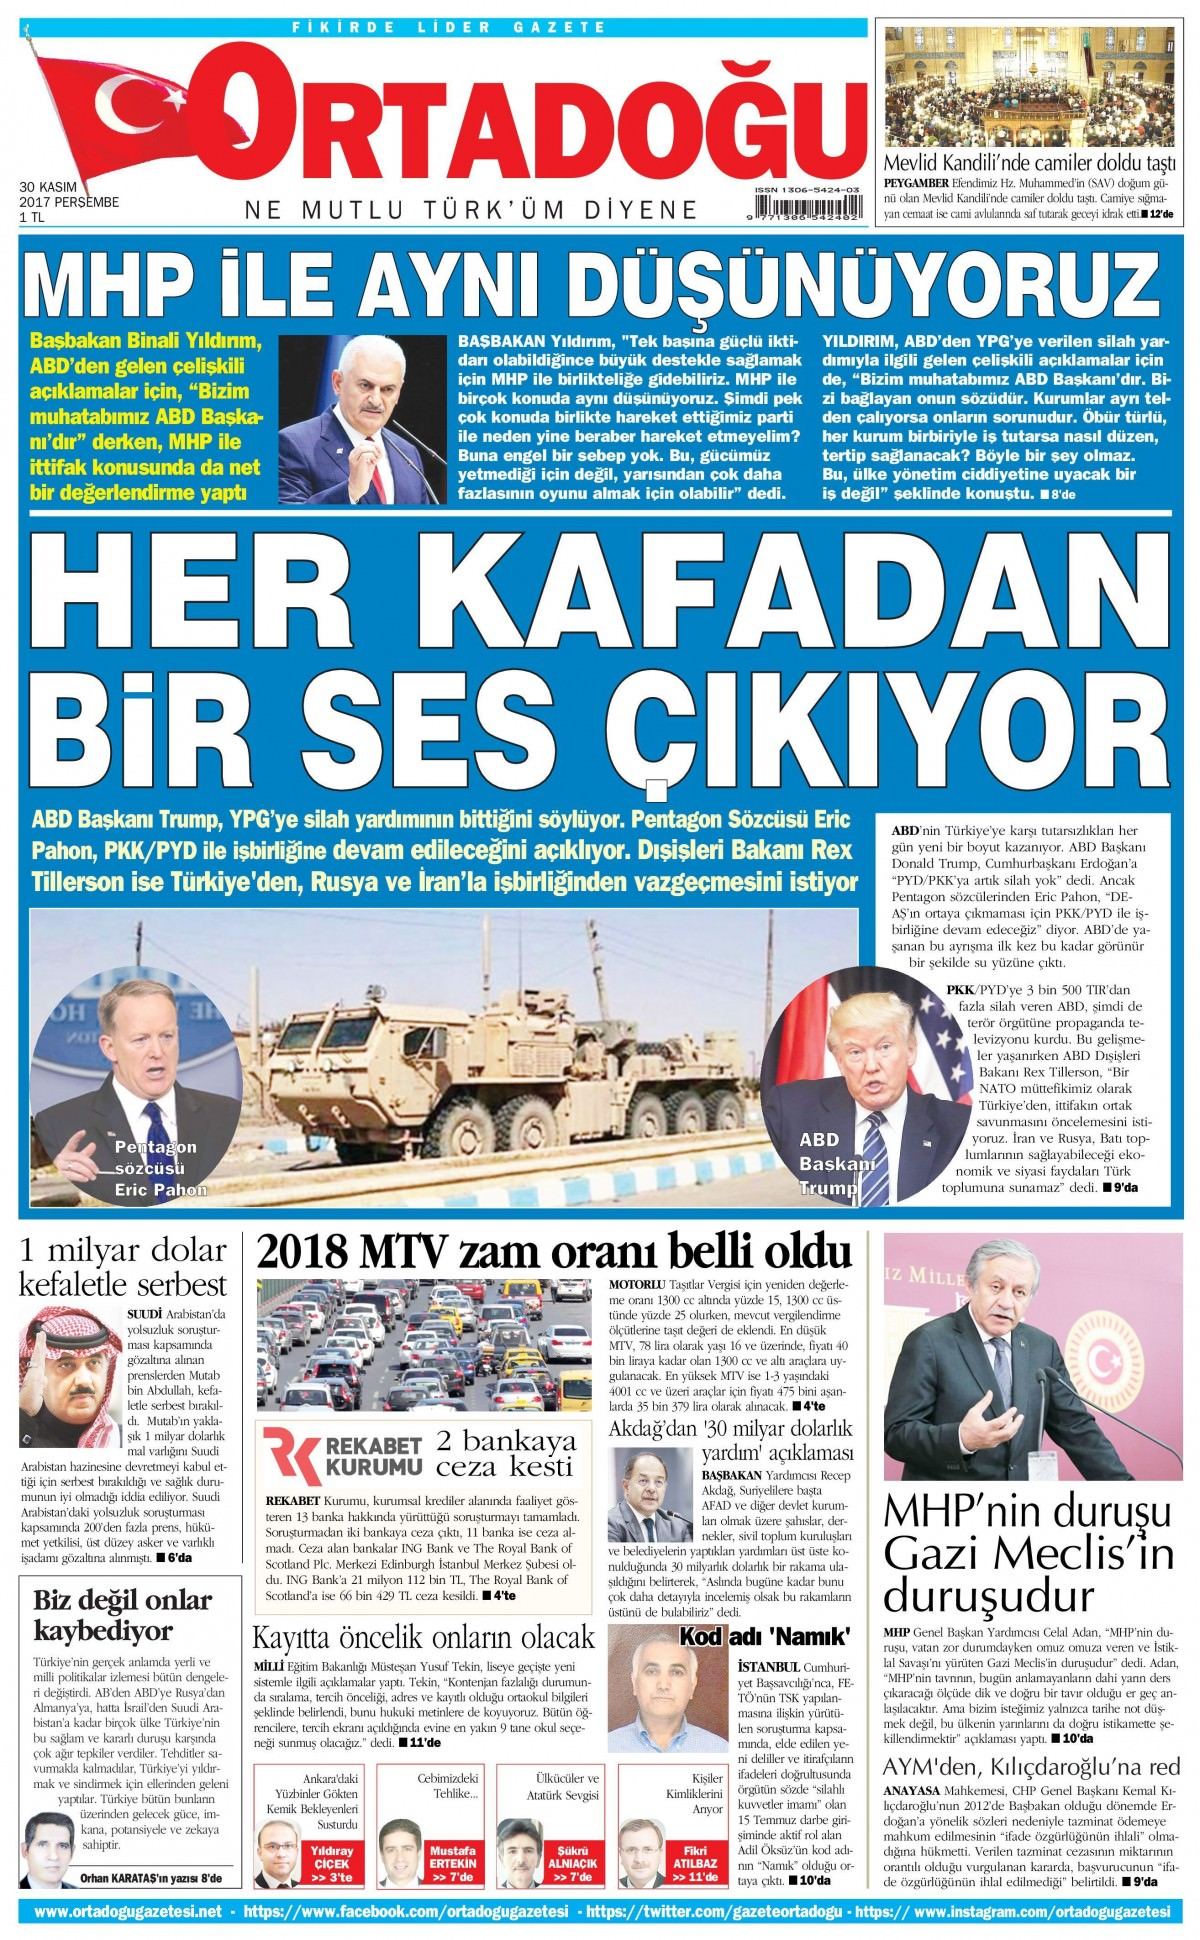 Gazeteler bugün hangi manşeti attı 15